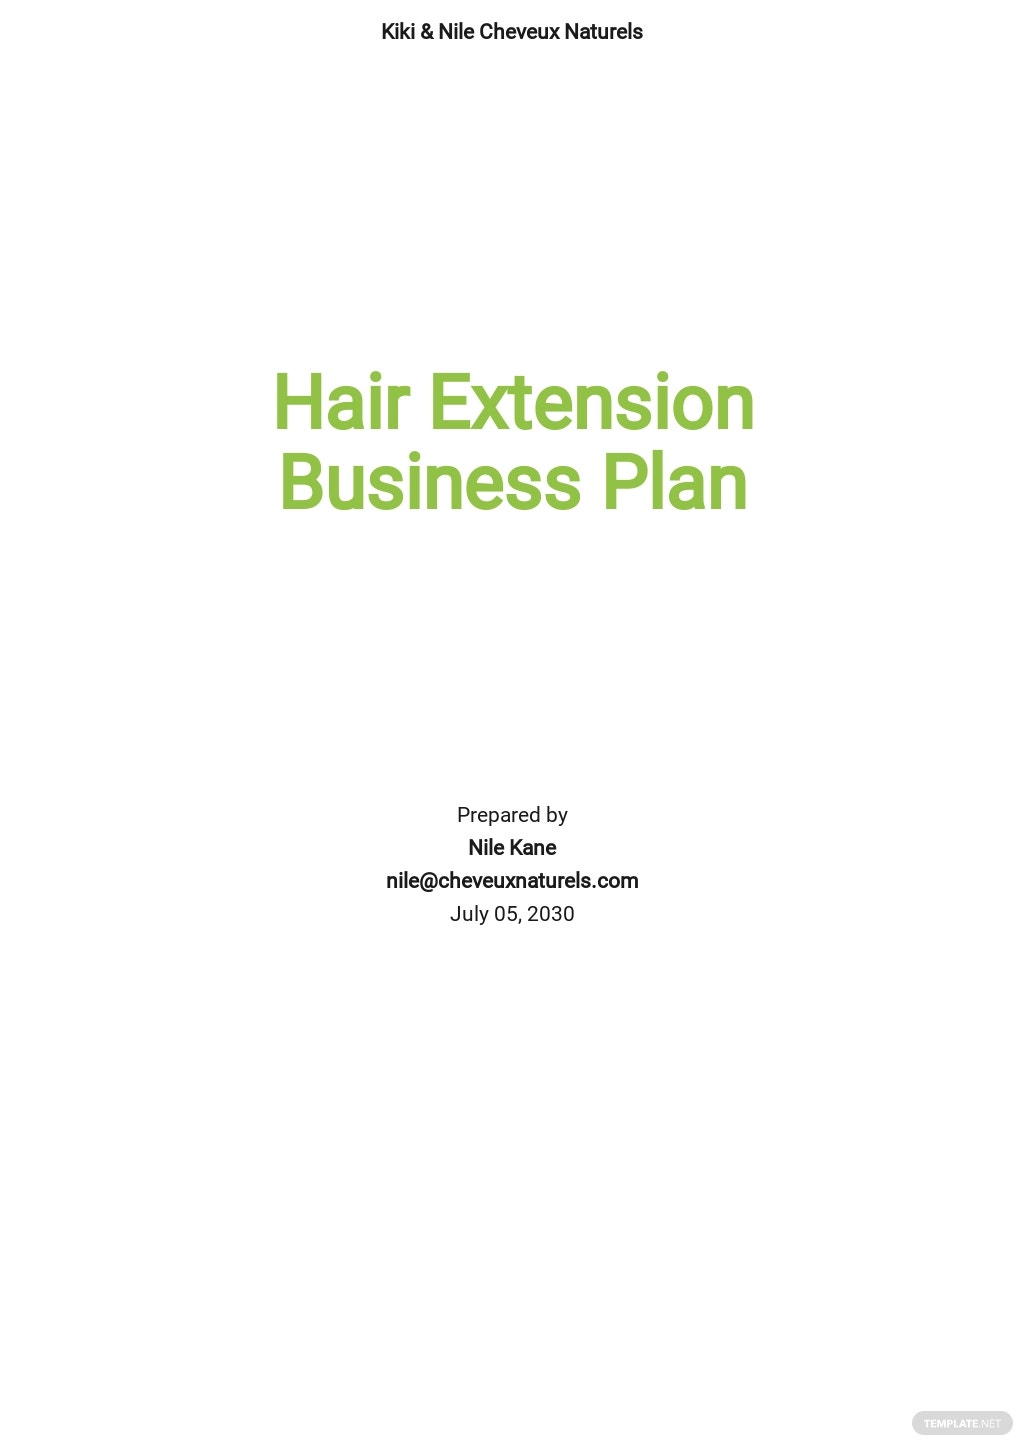 Hair Extension Business Plan Template